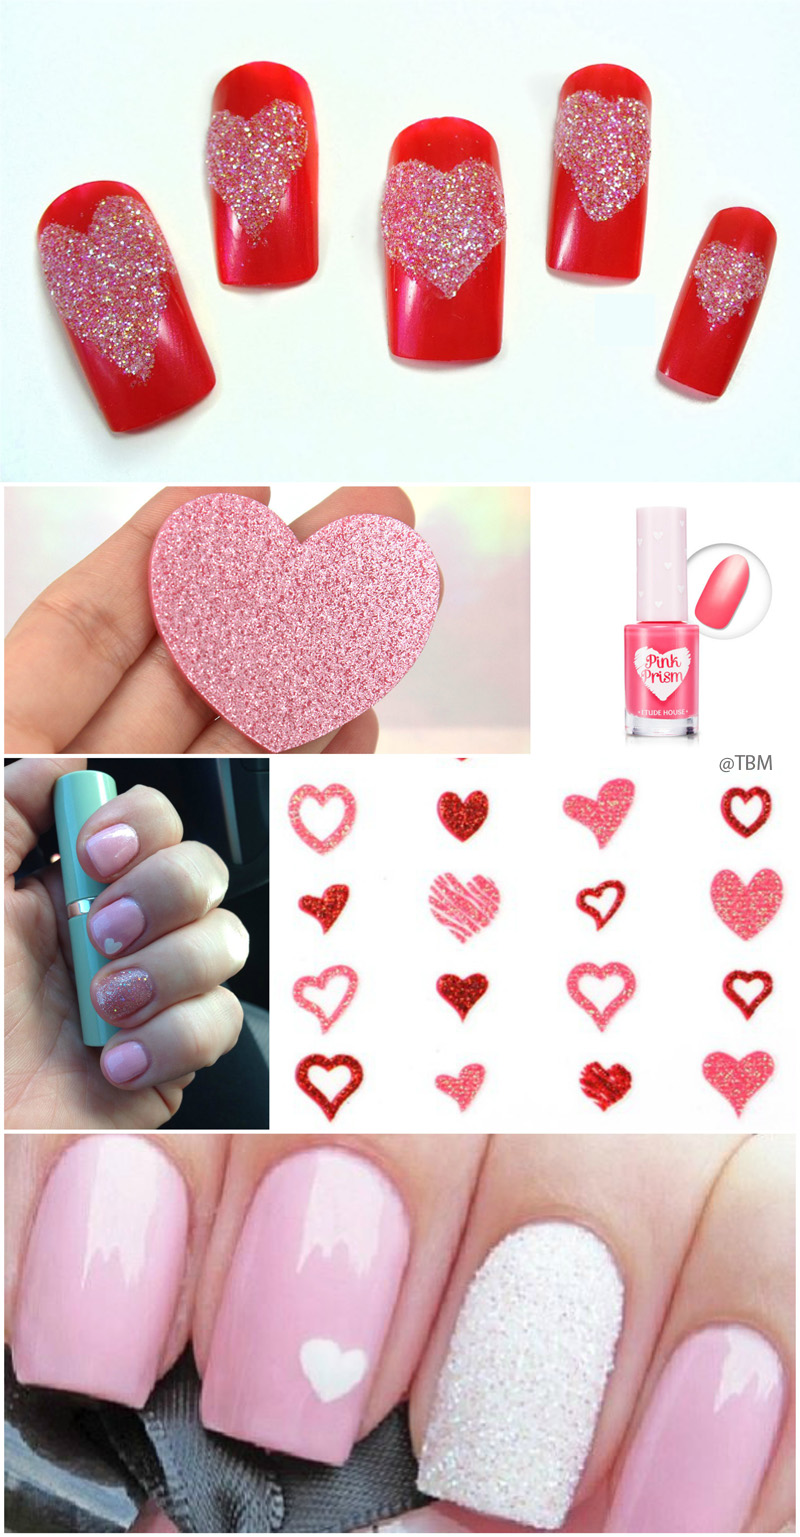 pink-glittery-heart-nails